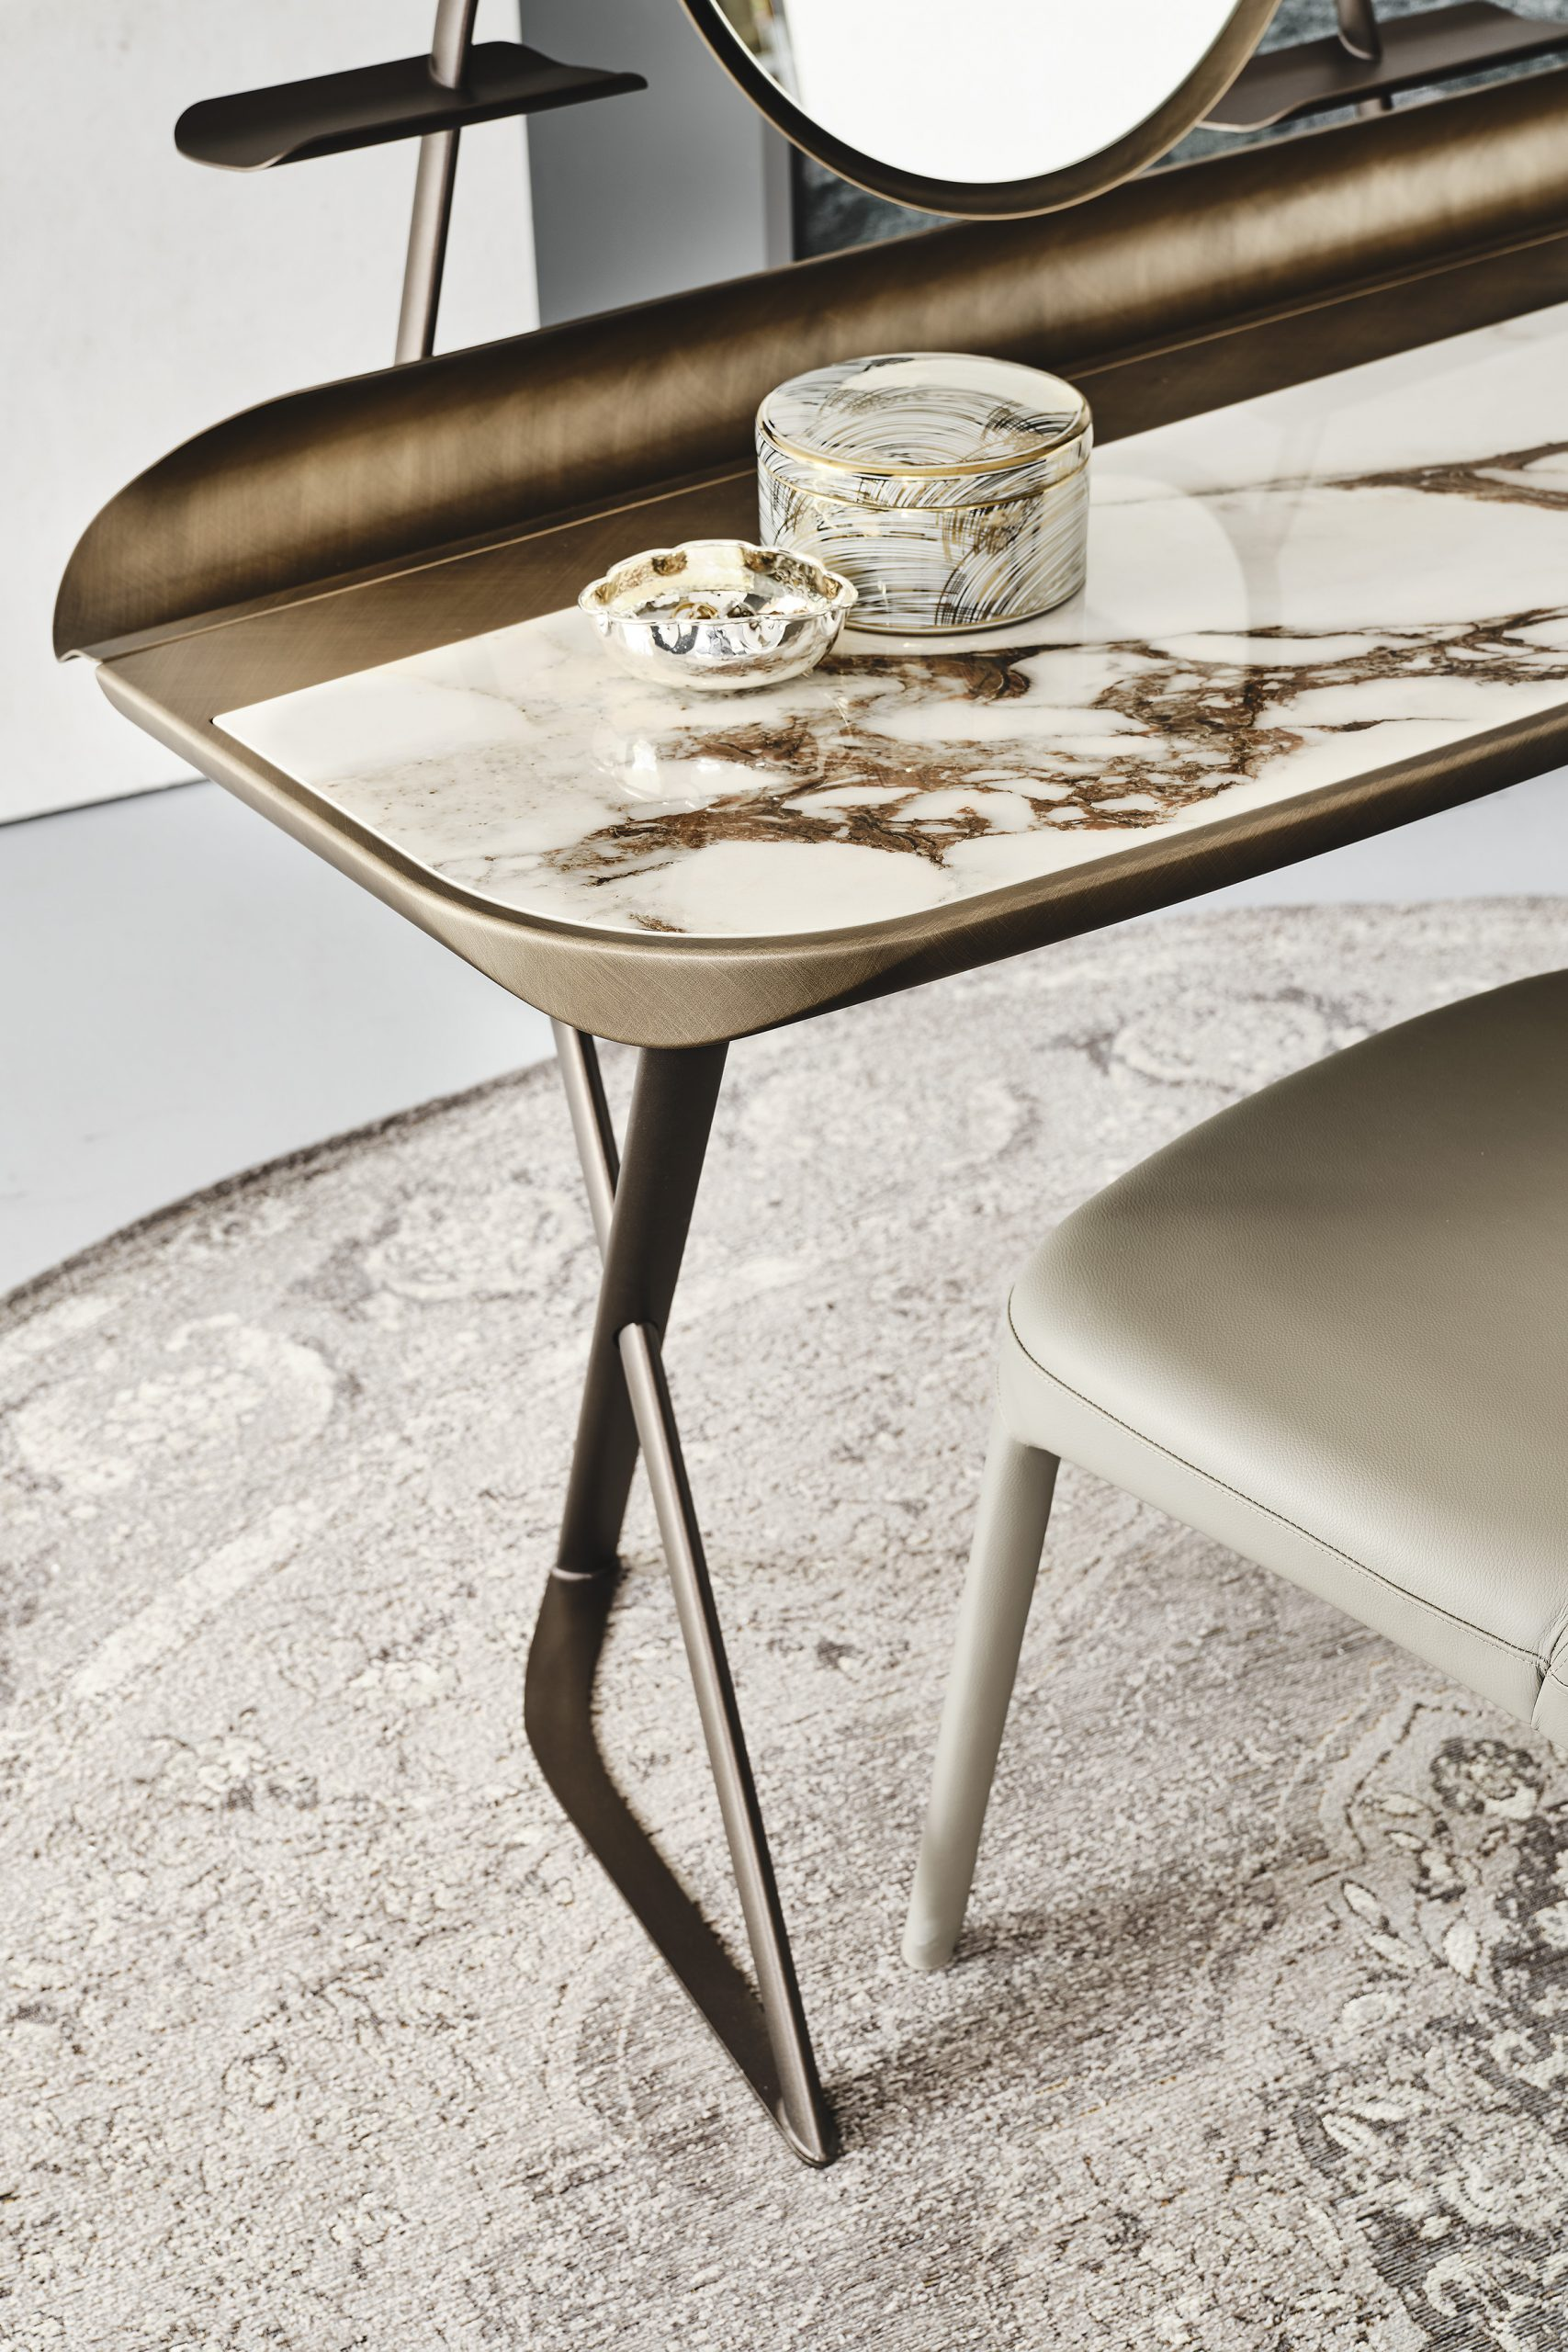 Cocoon-Trousse-Keramik-04